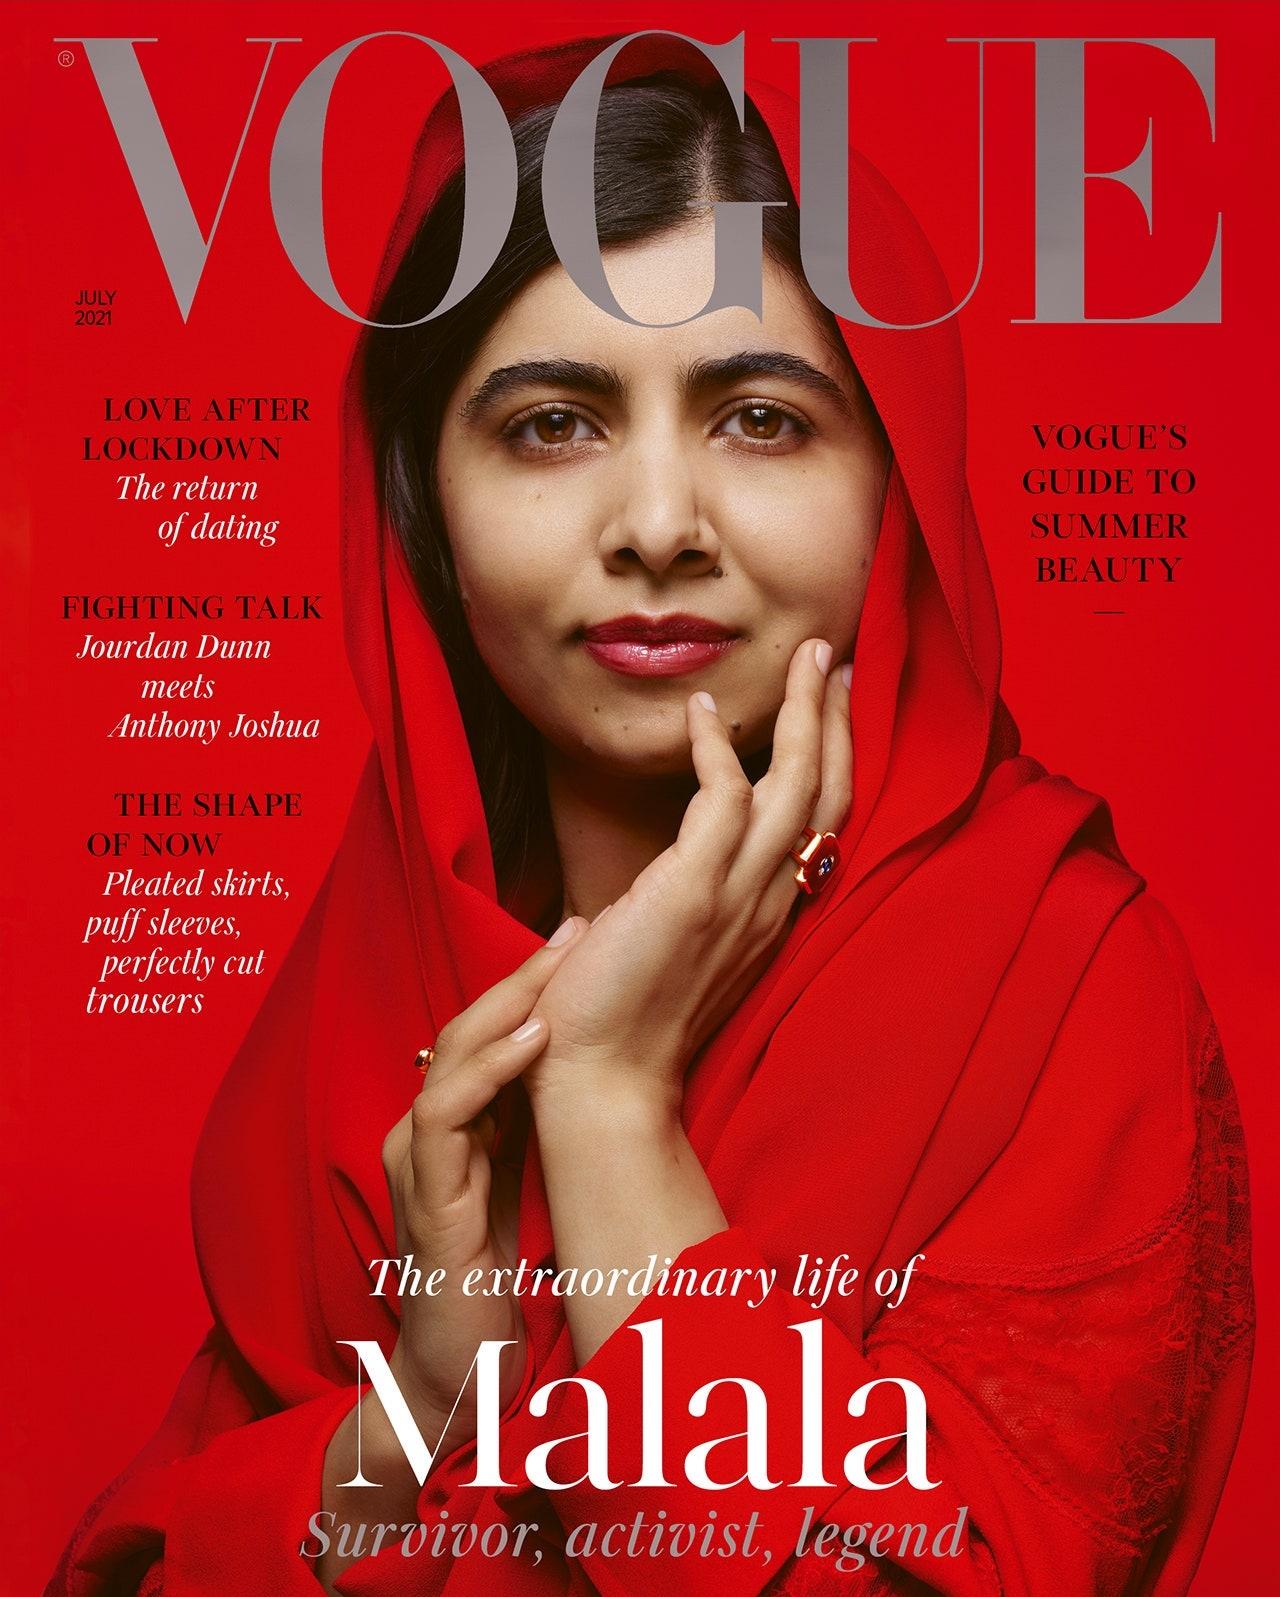 Vogue Magazine July